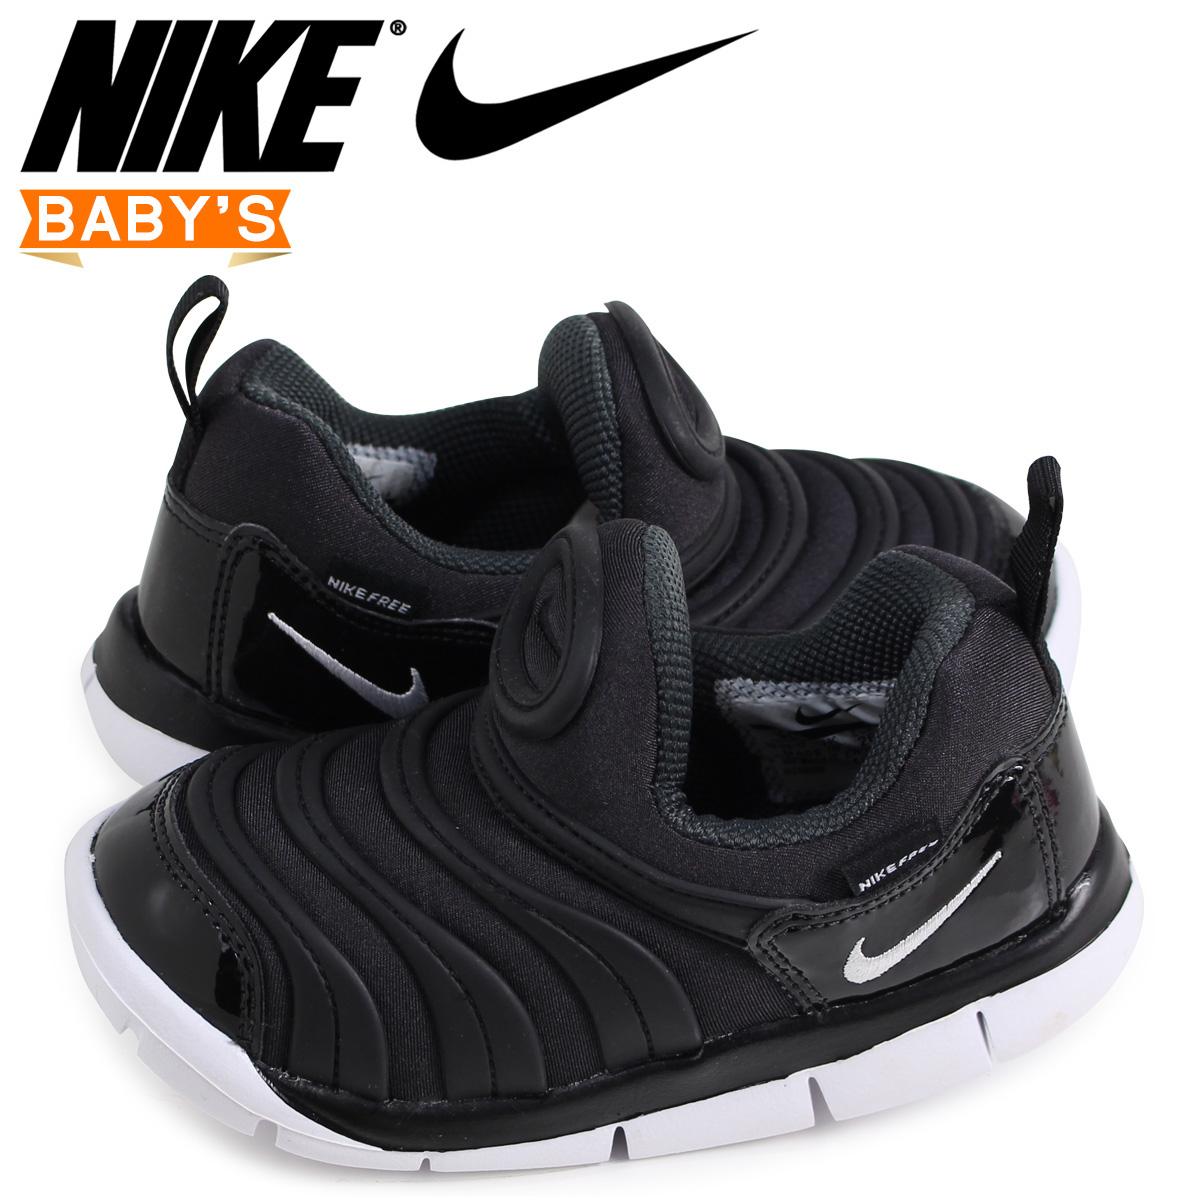 sneak online shop nike nike dynamo free baby sneakers dynamo free td 343 938 013 black 1 26. Black Bedroom Furniture Sets. Home Design Ideas